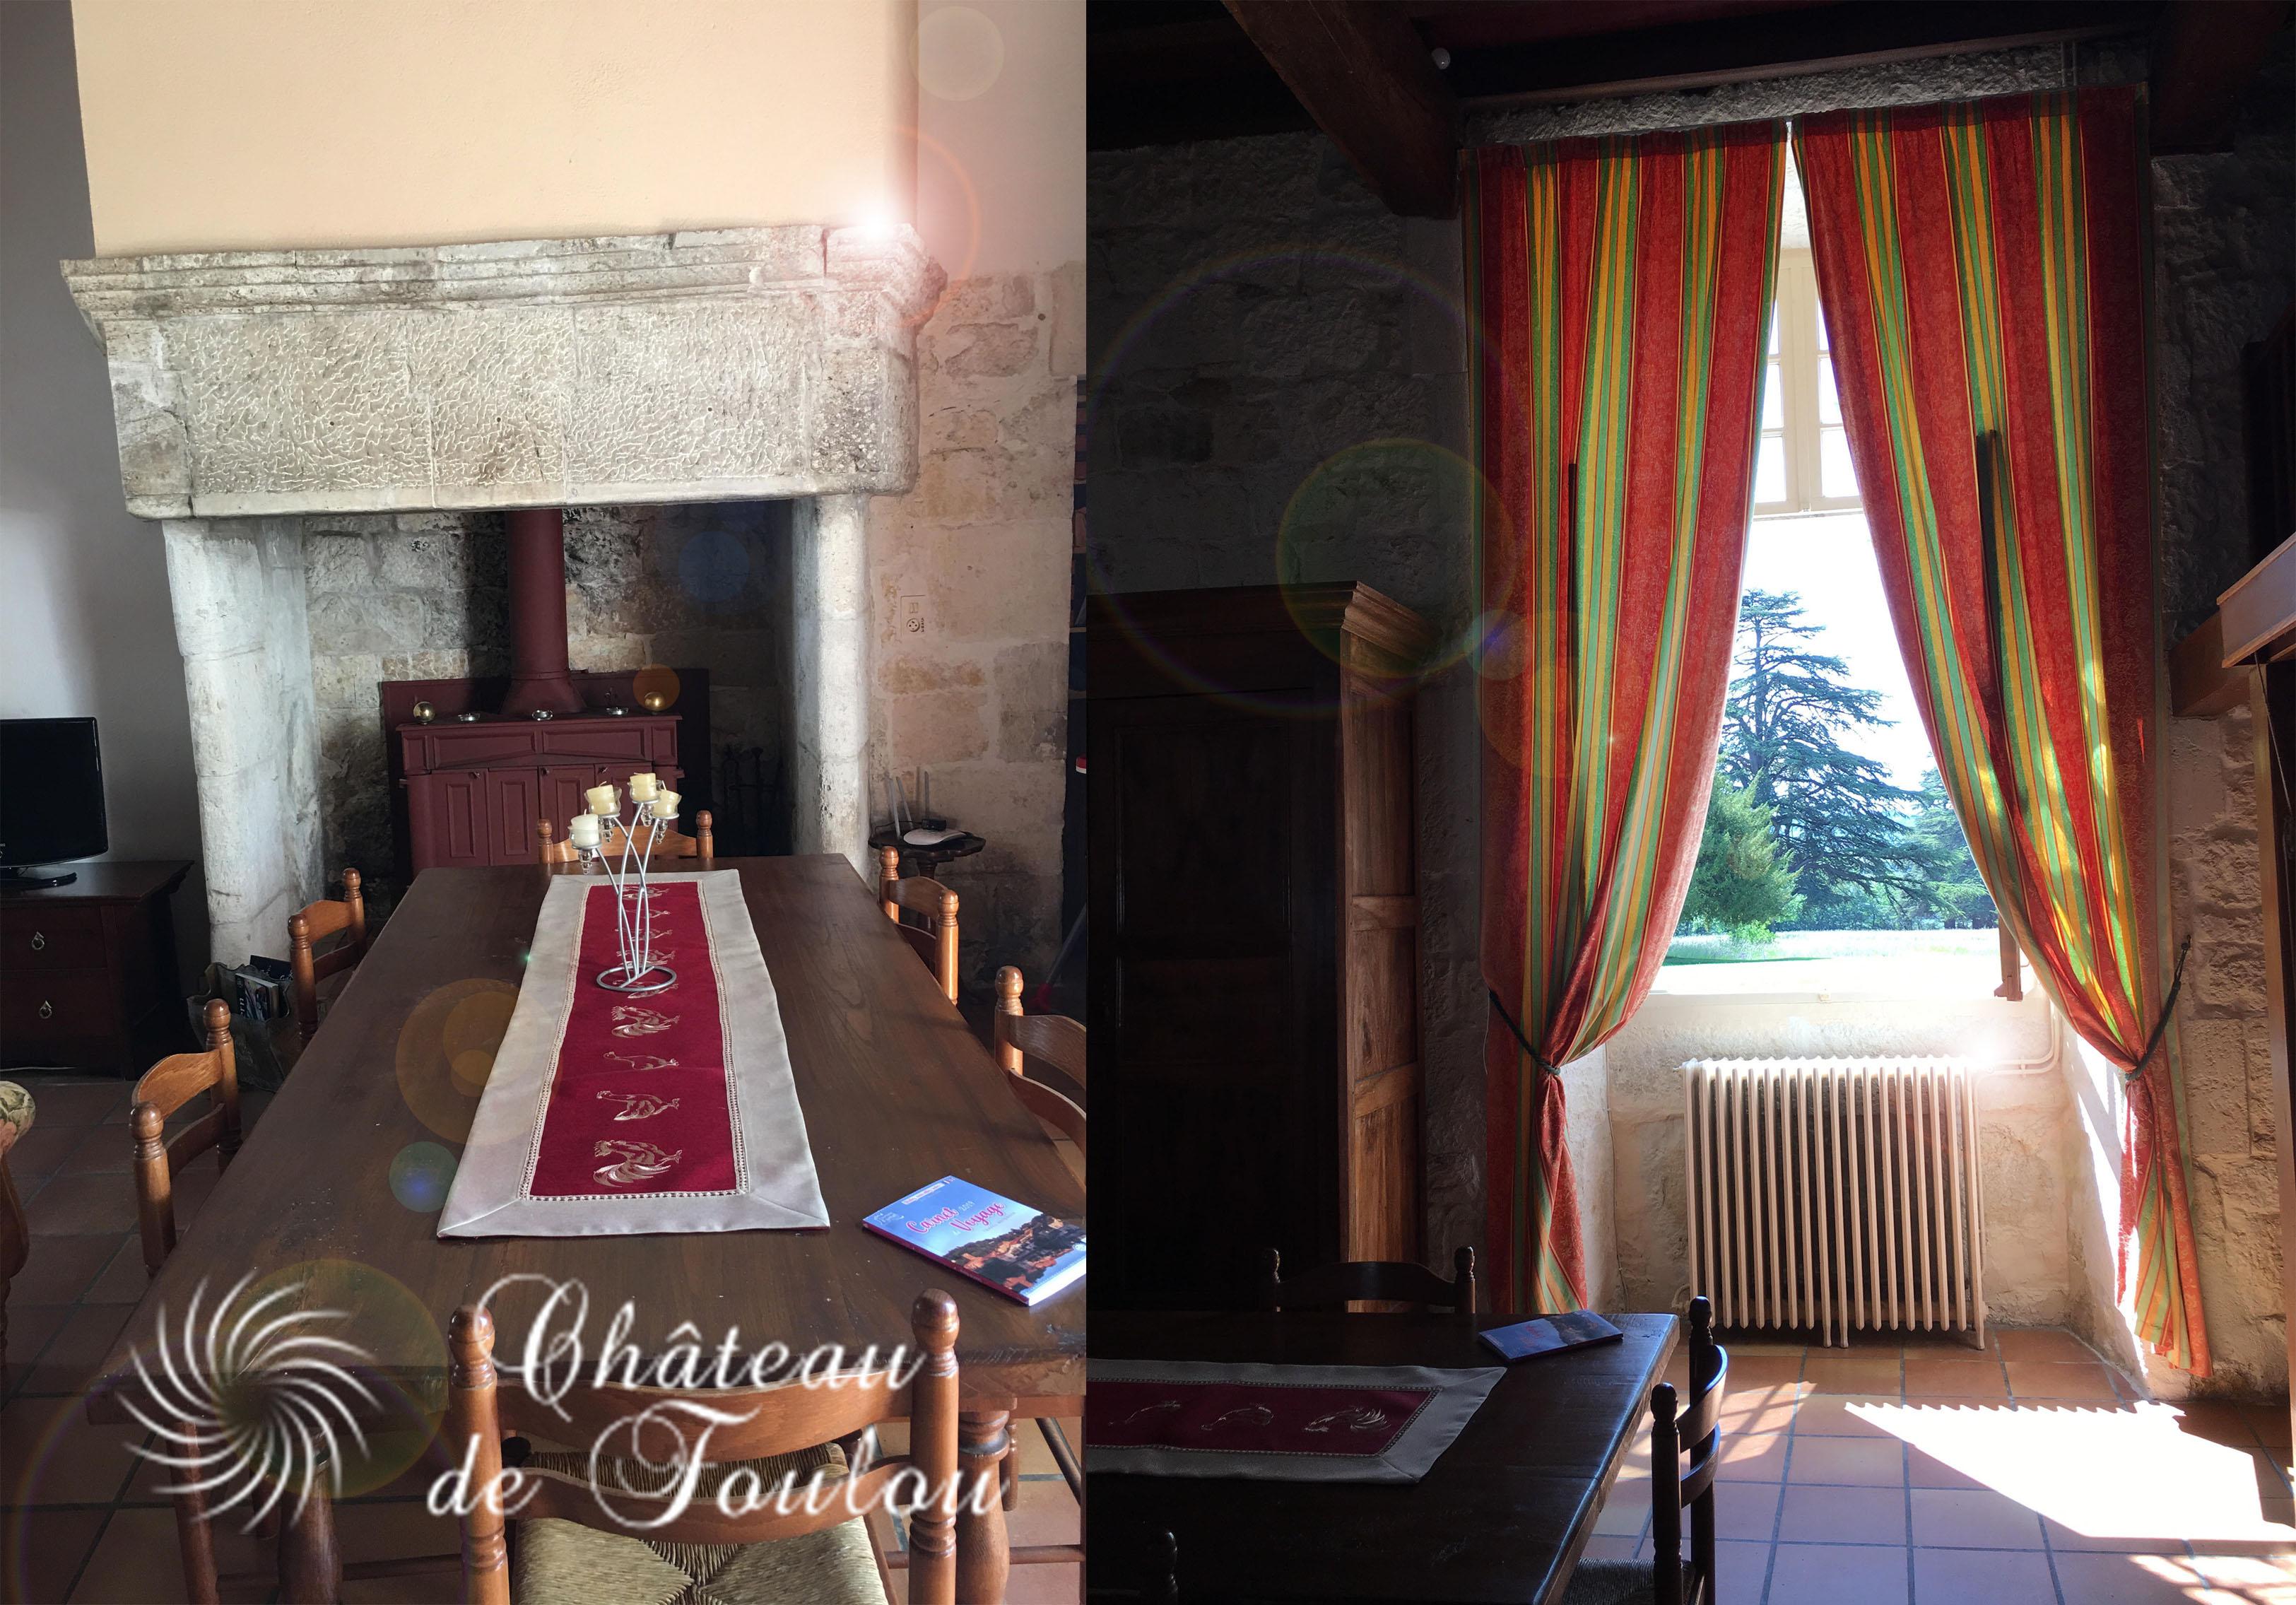 http://www.chateau-de-foulou.com/wp-content/uploads/2019/08/dddd.jpg